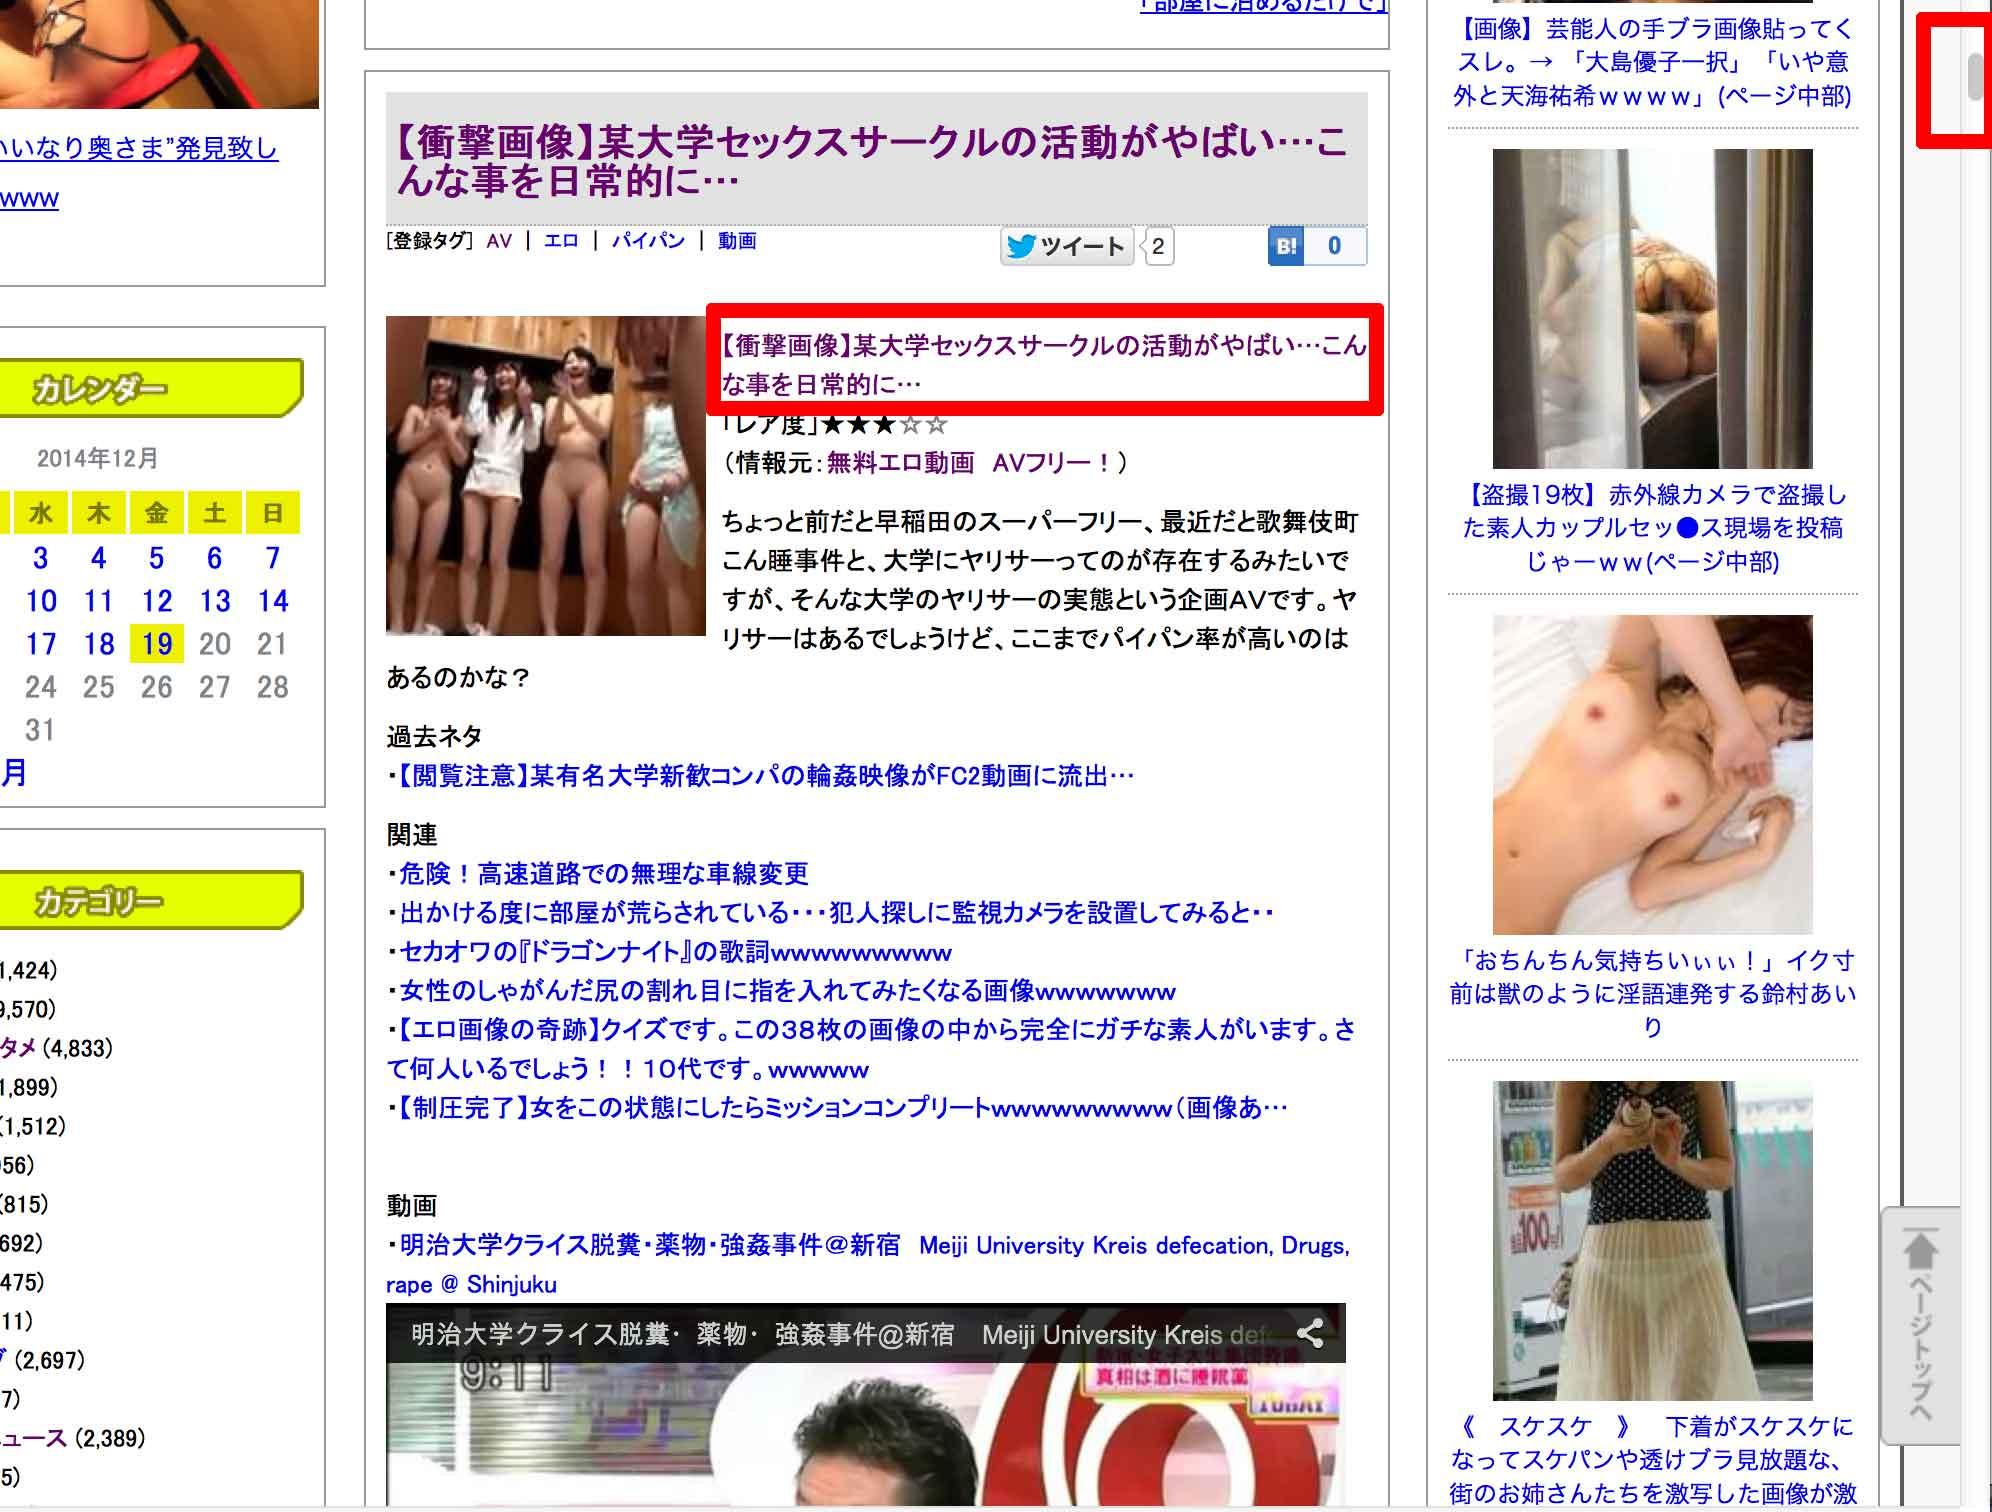 HanamiP40.zip Porns7.com 激レア - お花見パンチラ40 -